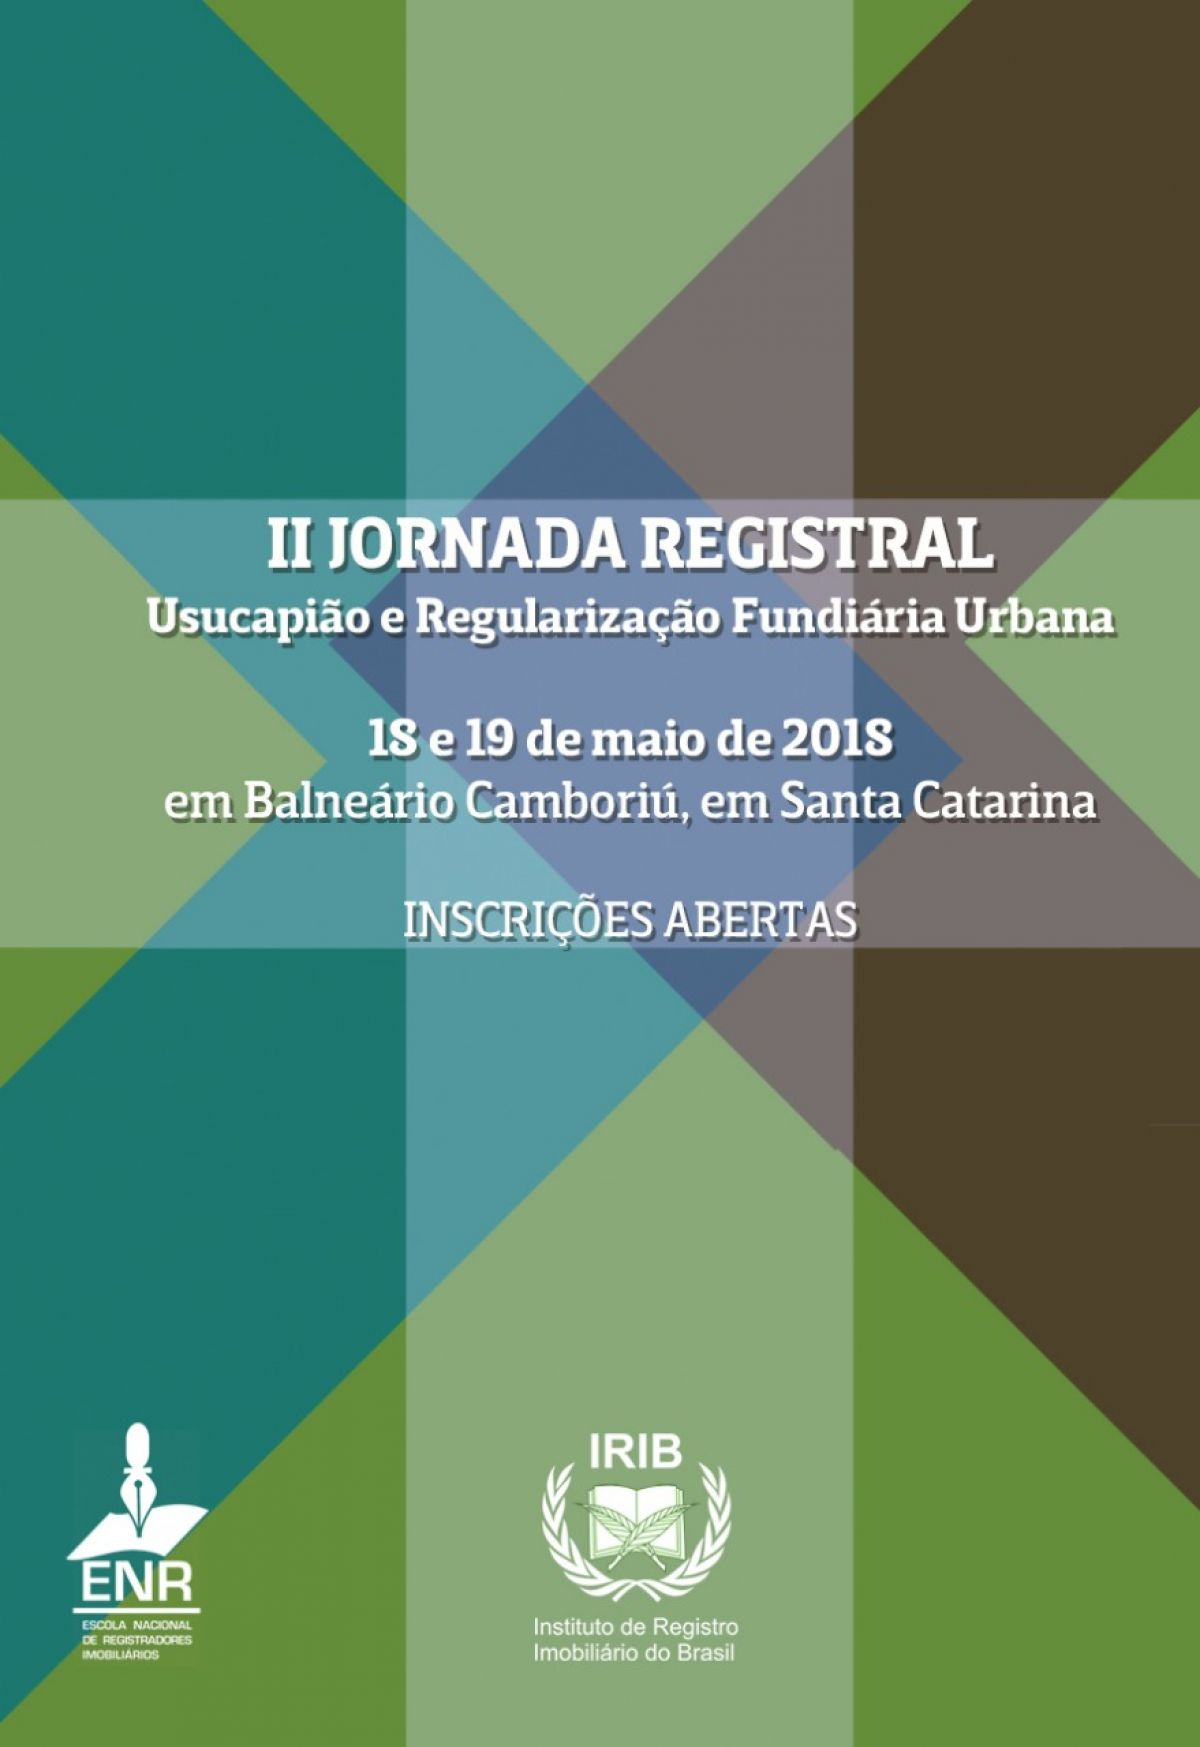 II JORNADA REGISTRAL